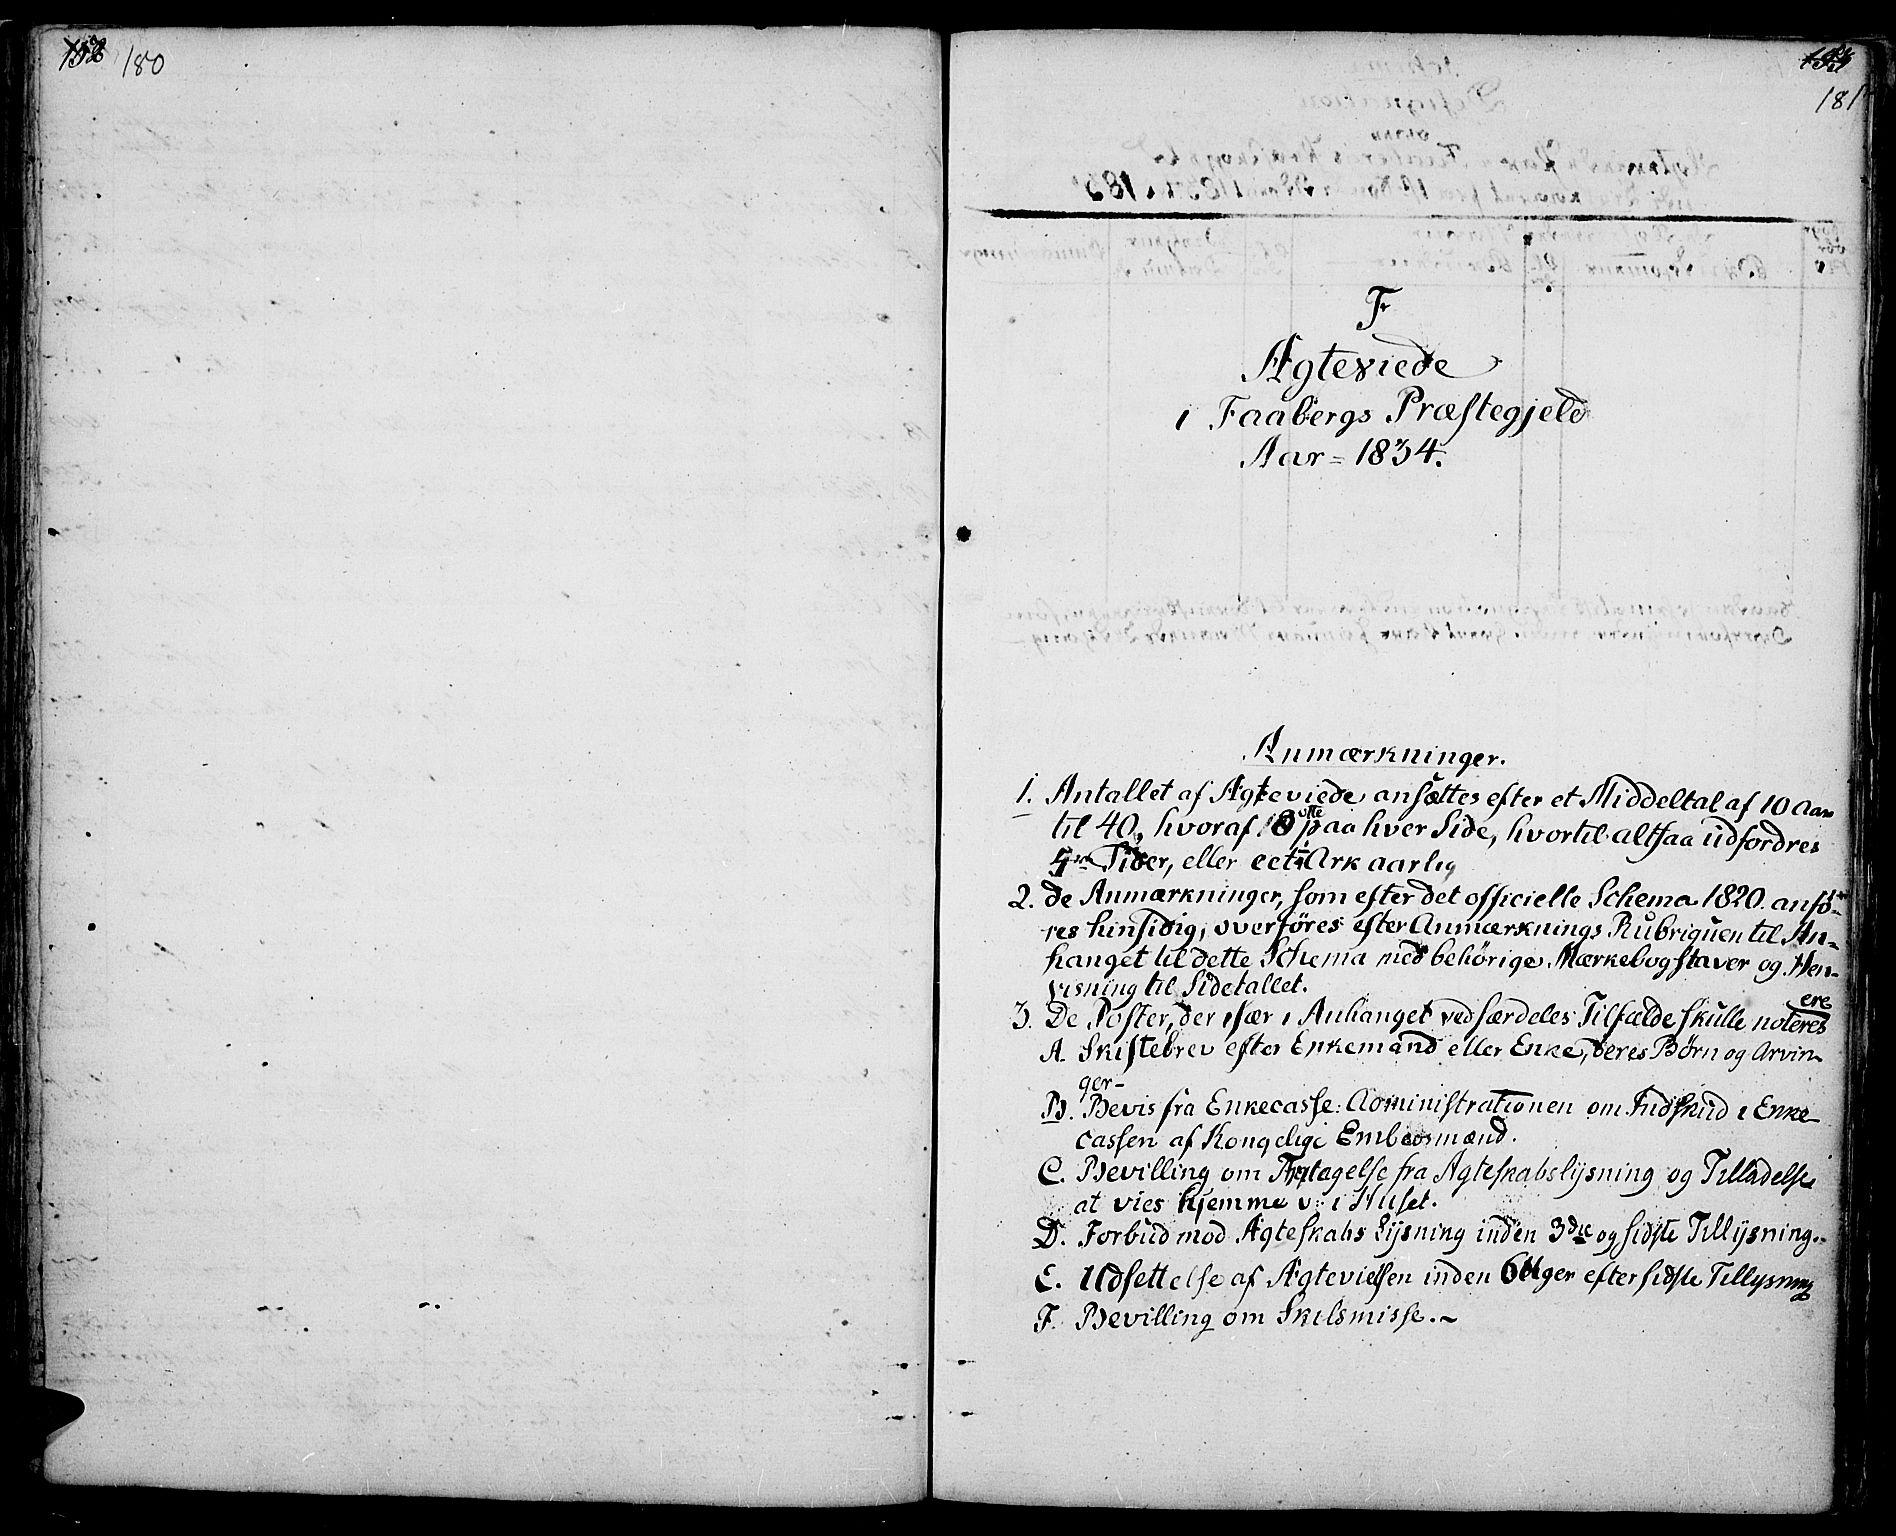 SAH, Fåberg prestekontor, Ministerialbok nr. 4, 1833-1837, s. 180-181